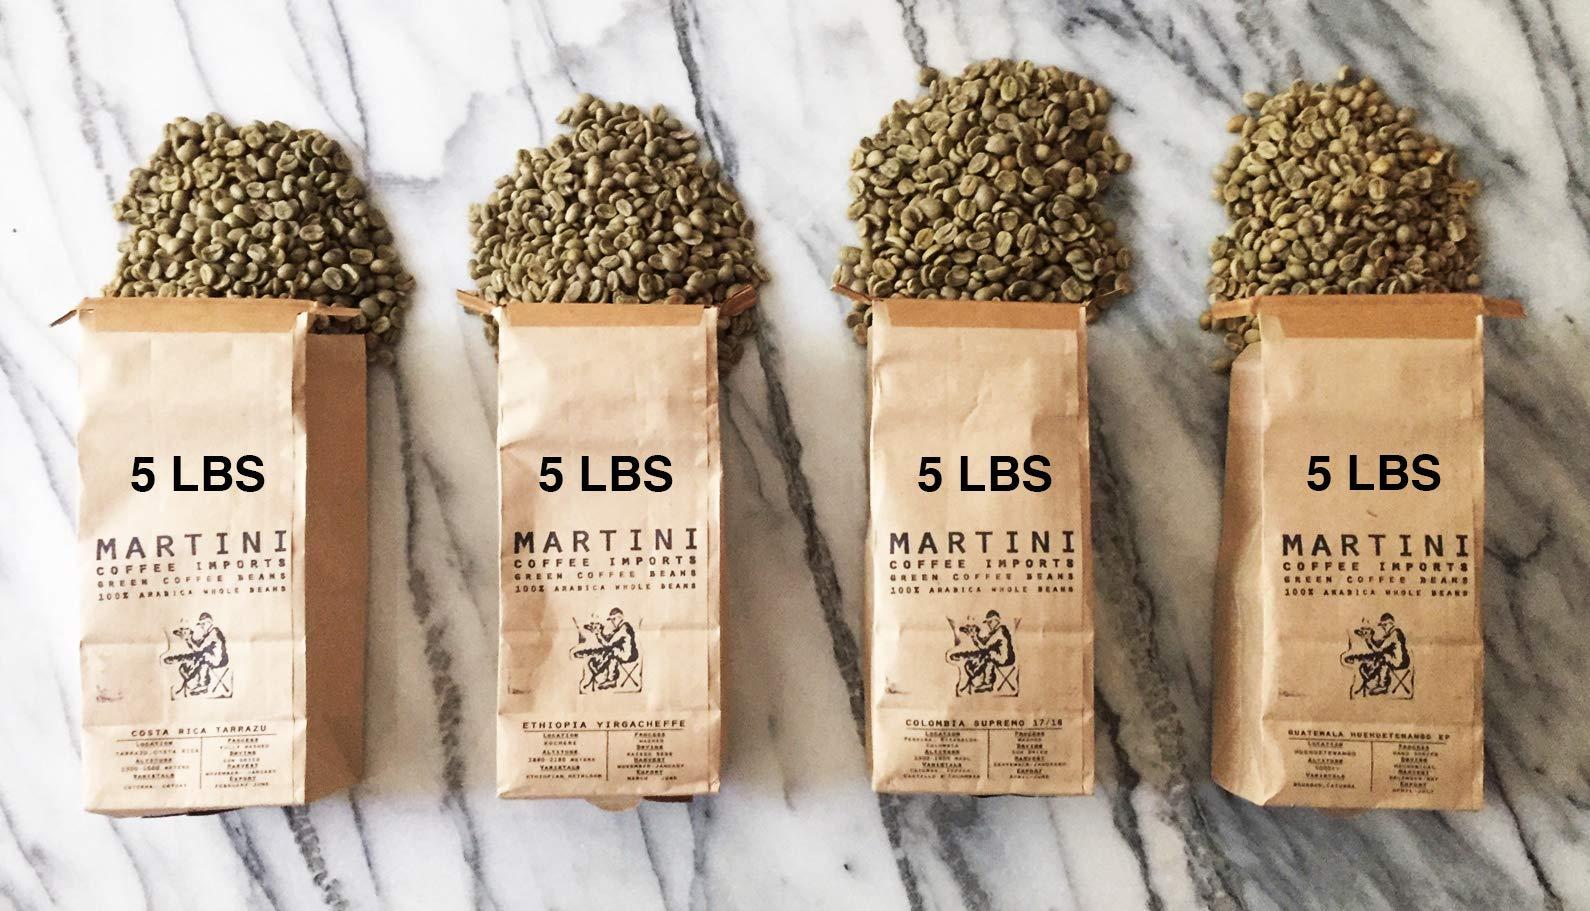 Unroasted Green Coffee Bean Sampler Pack - 20 LBS - 100% raw arabica coffee beans - COLOMBIA, ETHIOPIA, GUATEMALA, COSTA RICA, BRAZIL